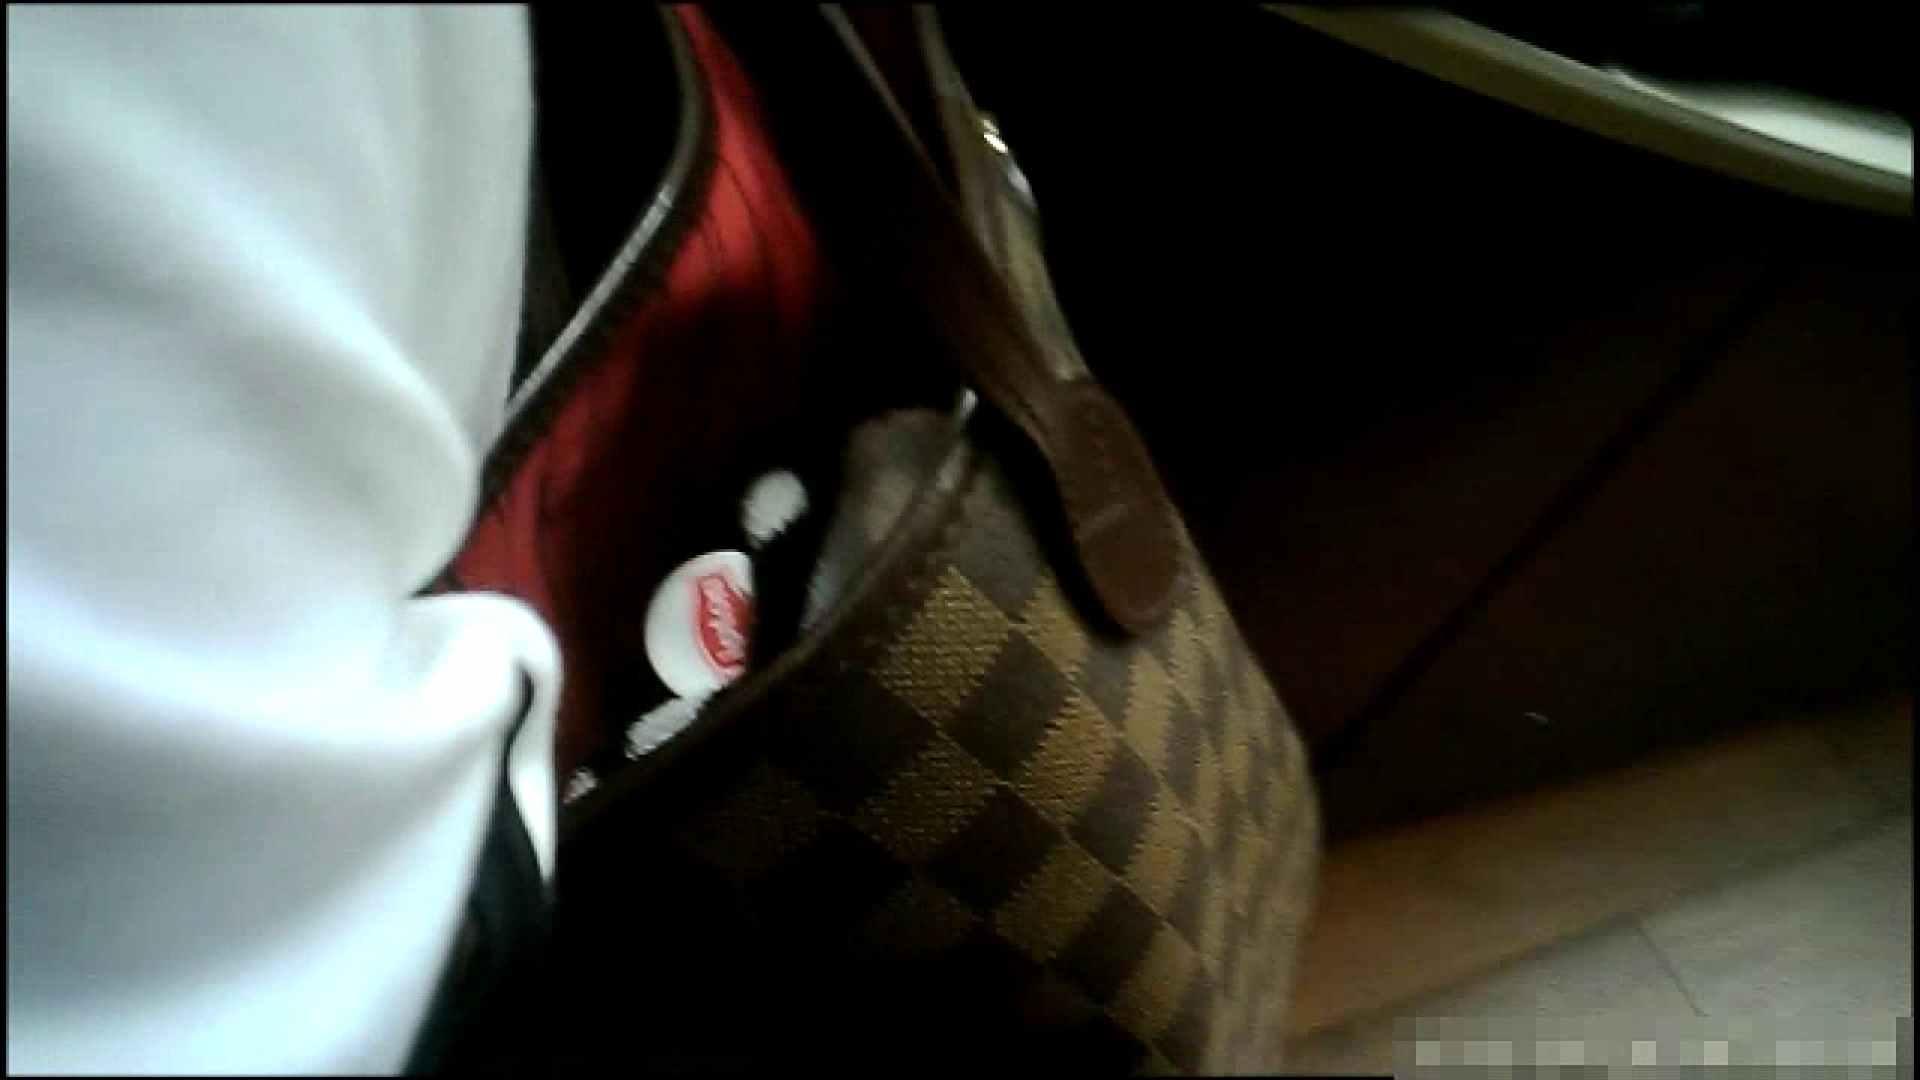 NO.2 高飛車でプライドの高い友人【某ファッションビル靴下屋】 お姉さんの胸チラ   ギャルズ  76画像 26